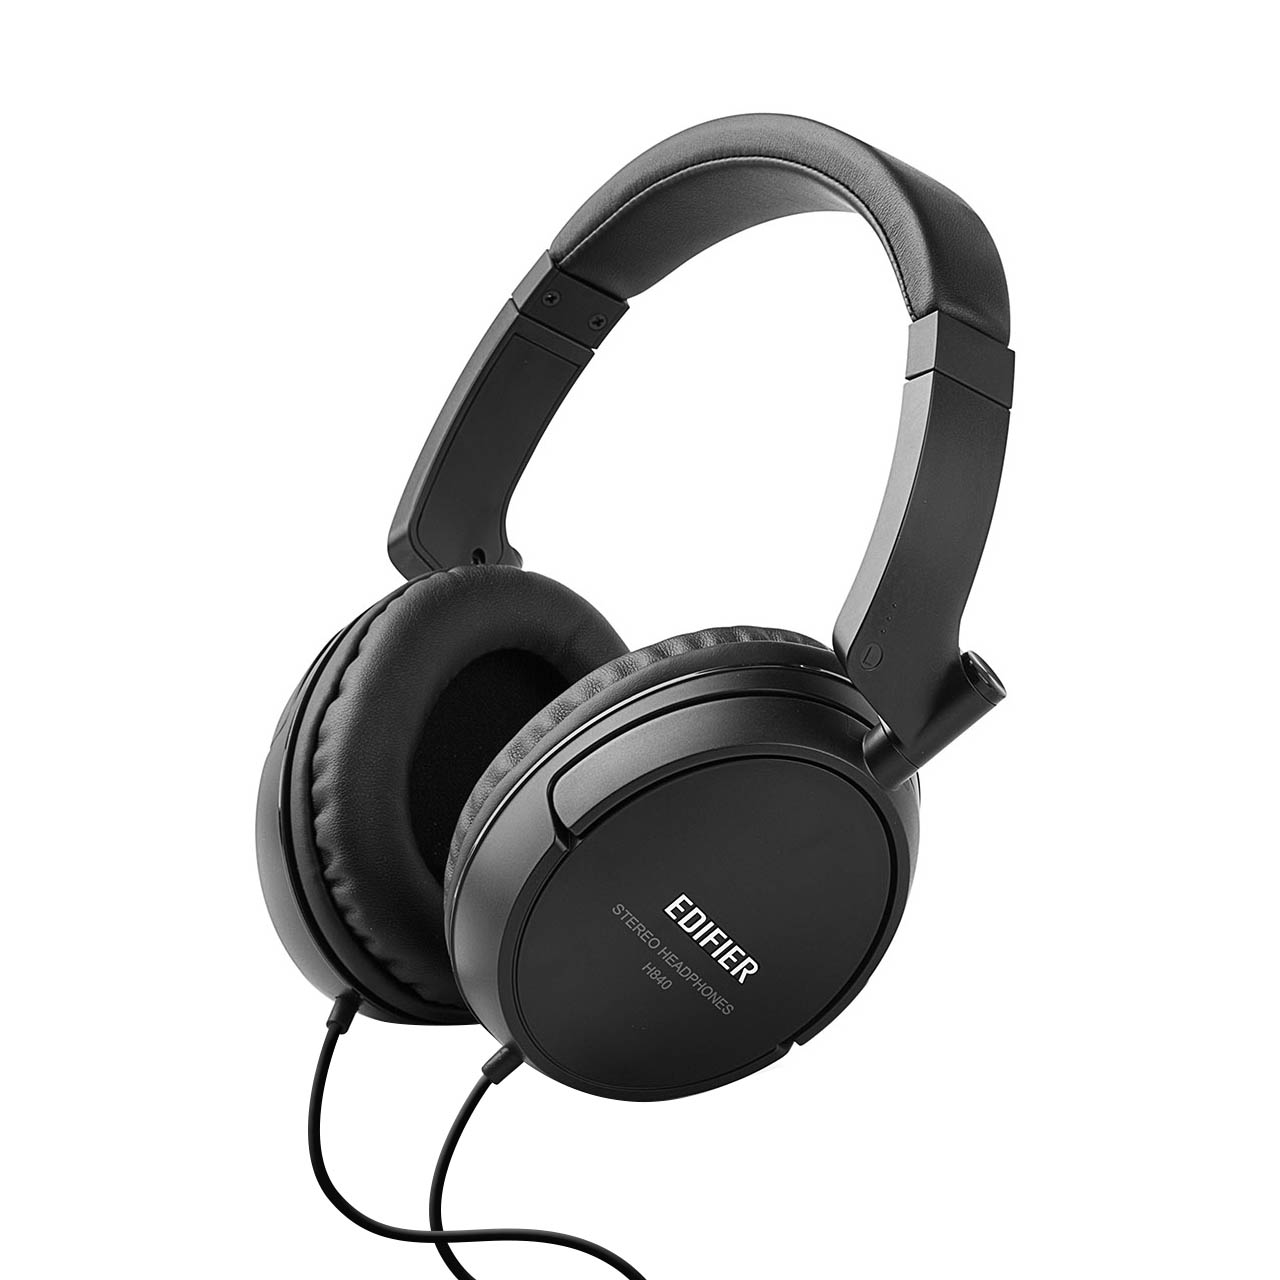 Iusun Wireless 4.1 Bluetooth Foldable Headset Stereo Headphone Earphone For IPhone White Sale